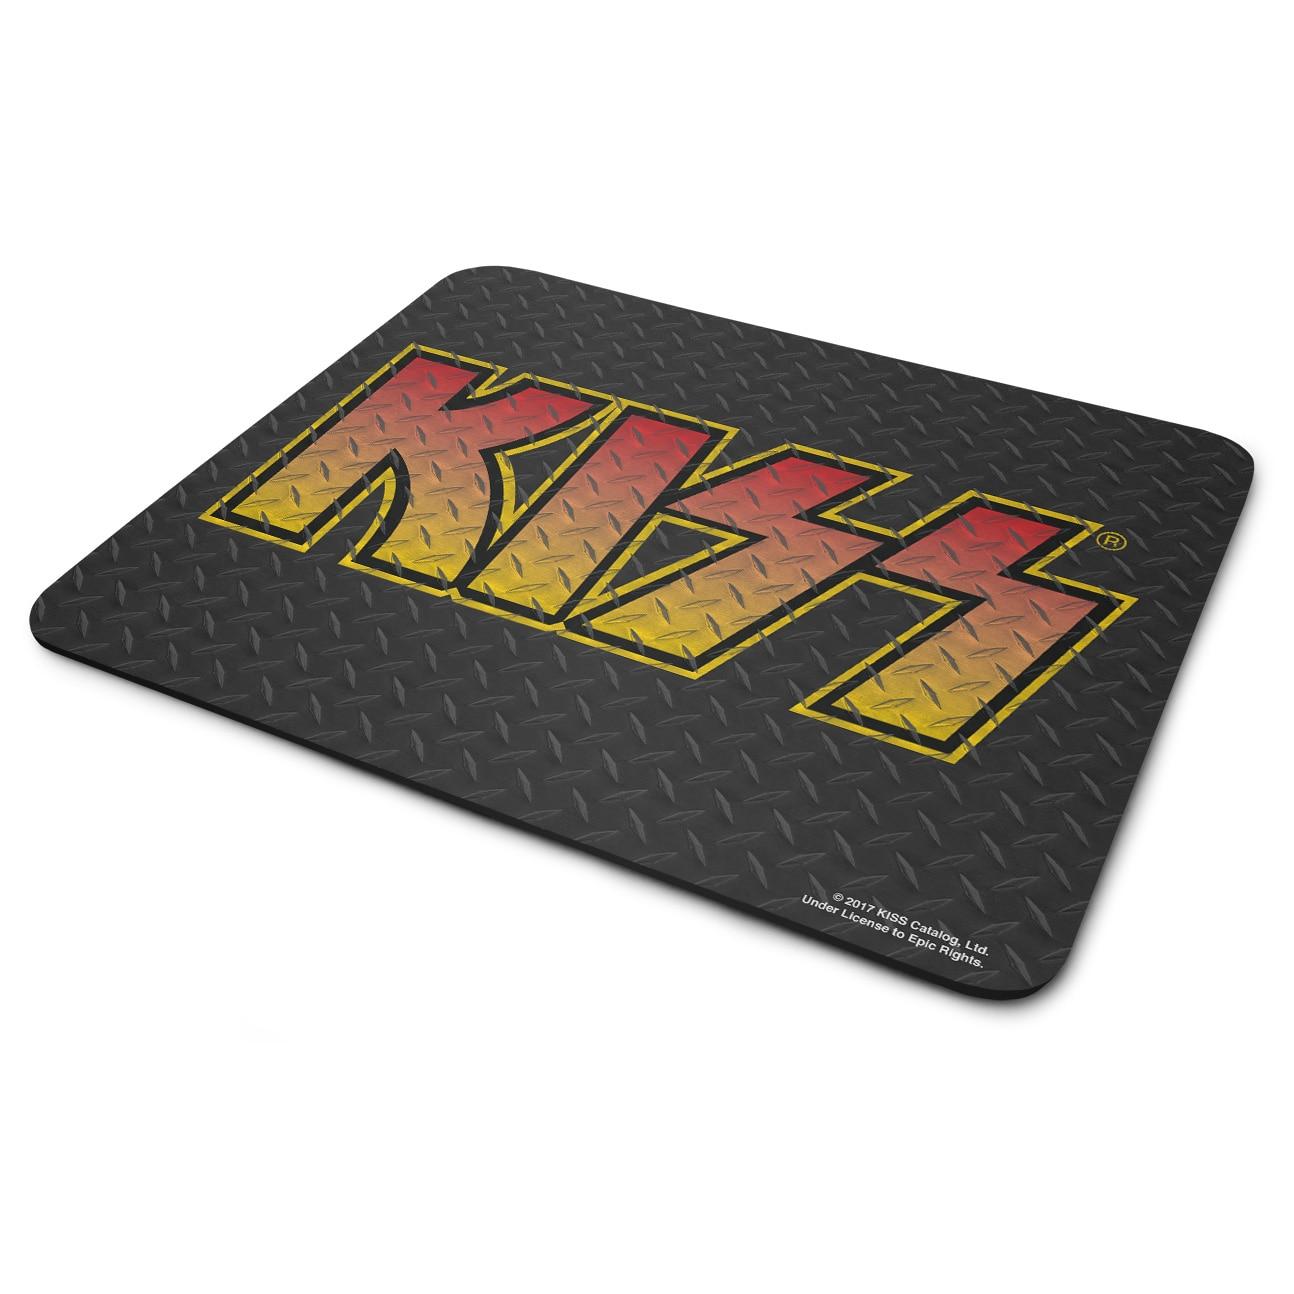 KISS Diamond Plate Logo Mouse Pad 3-Pack